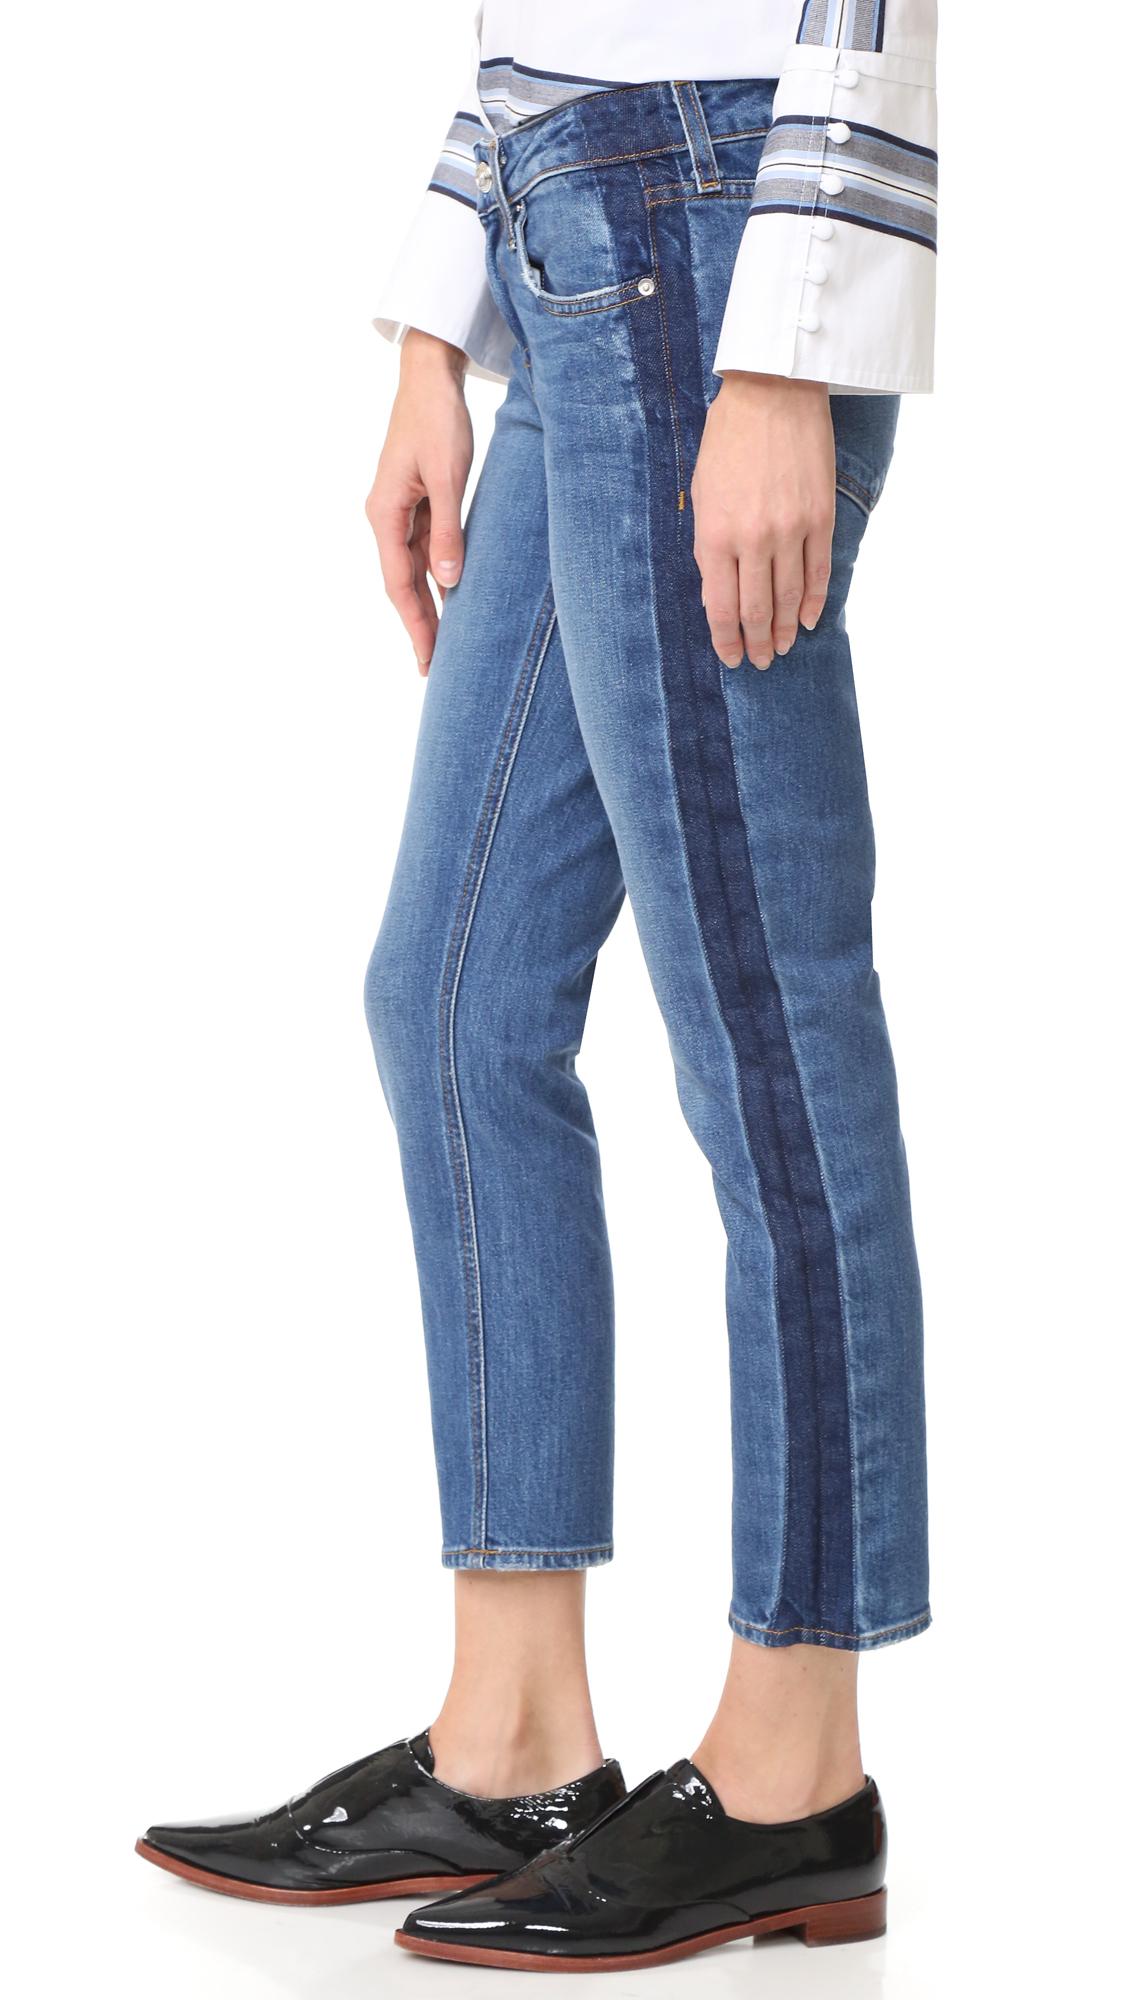 Derek Lam 10 Crosby Mila Tuxedo Stripe Boyfriend Jeans - Medium Wash at Shopbop